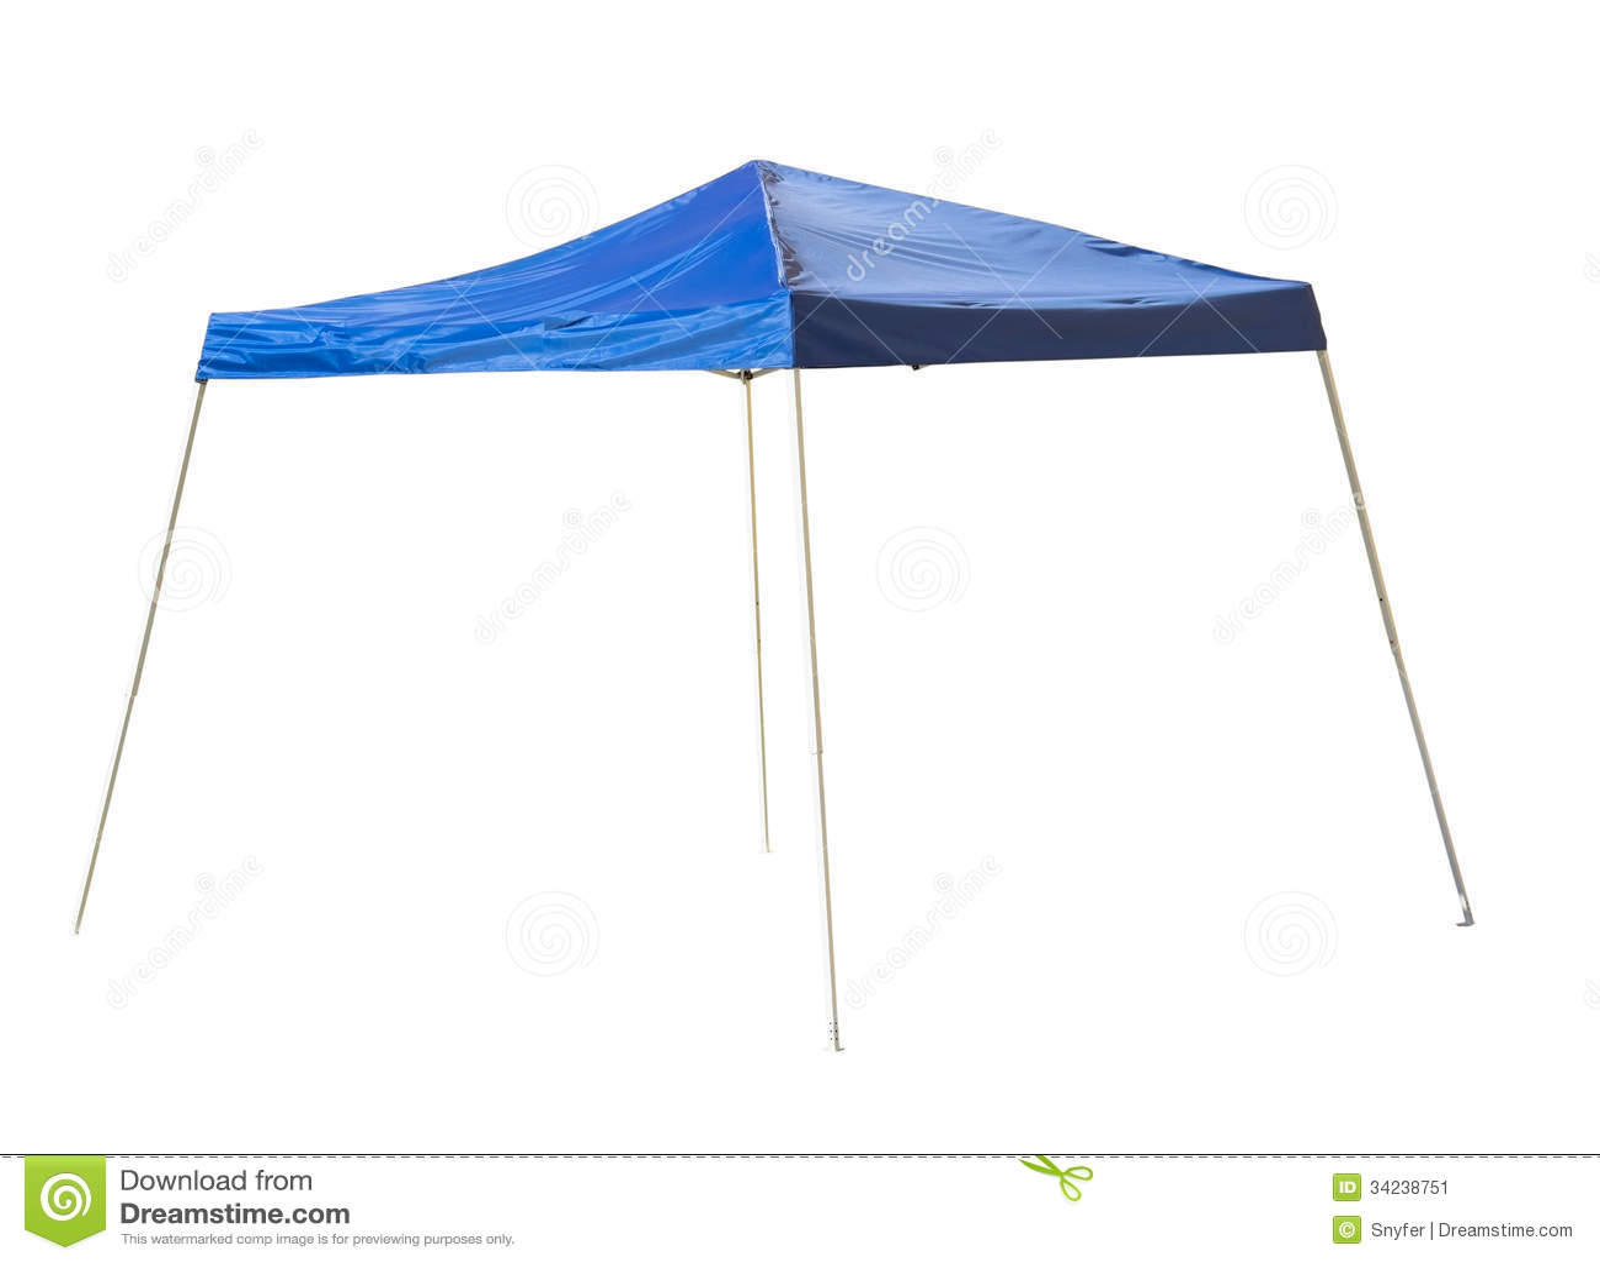 Blue rain tent.  sc 1 st  Dreamstime.com & Blue rain tent. stock image. Image of isolated shadow - 34238751